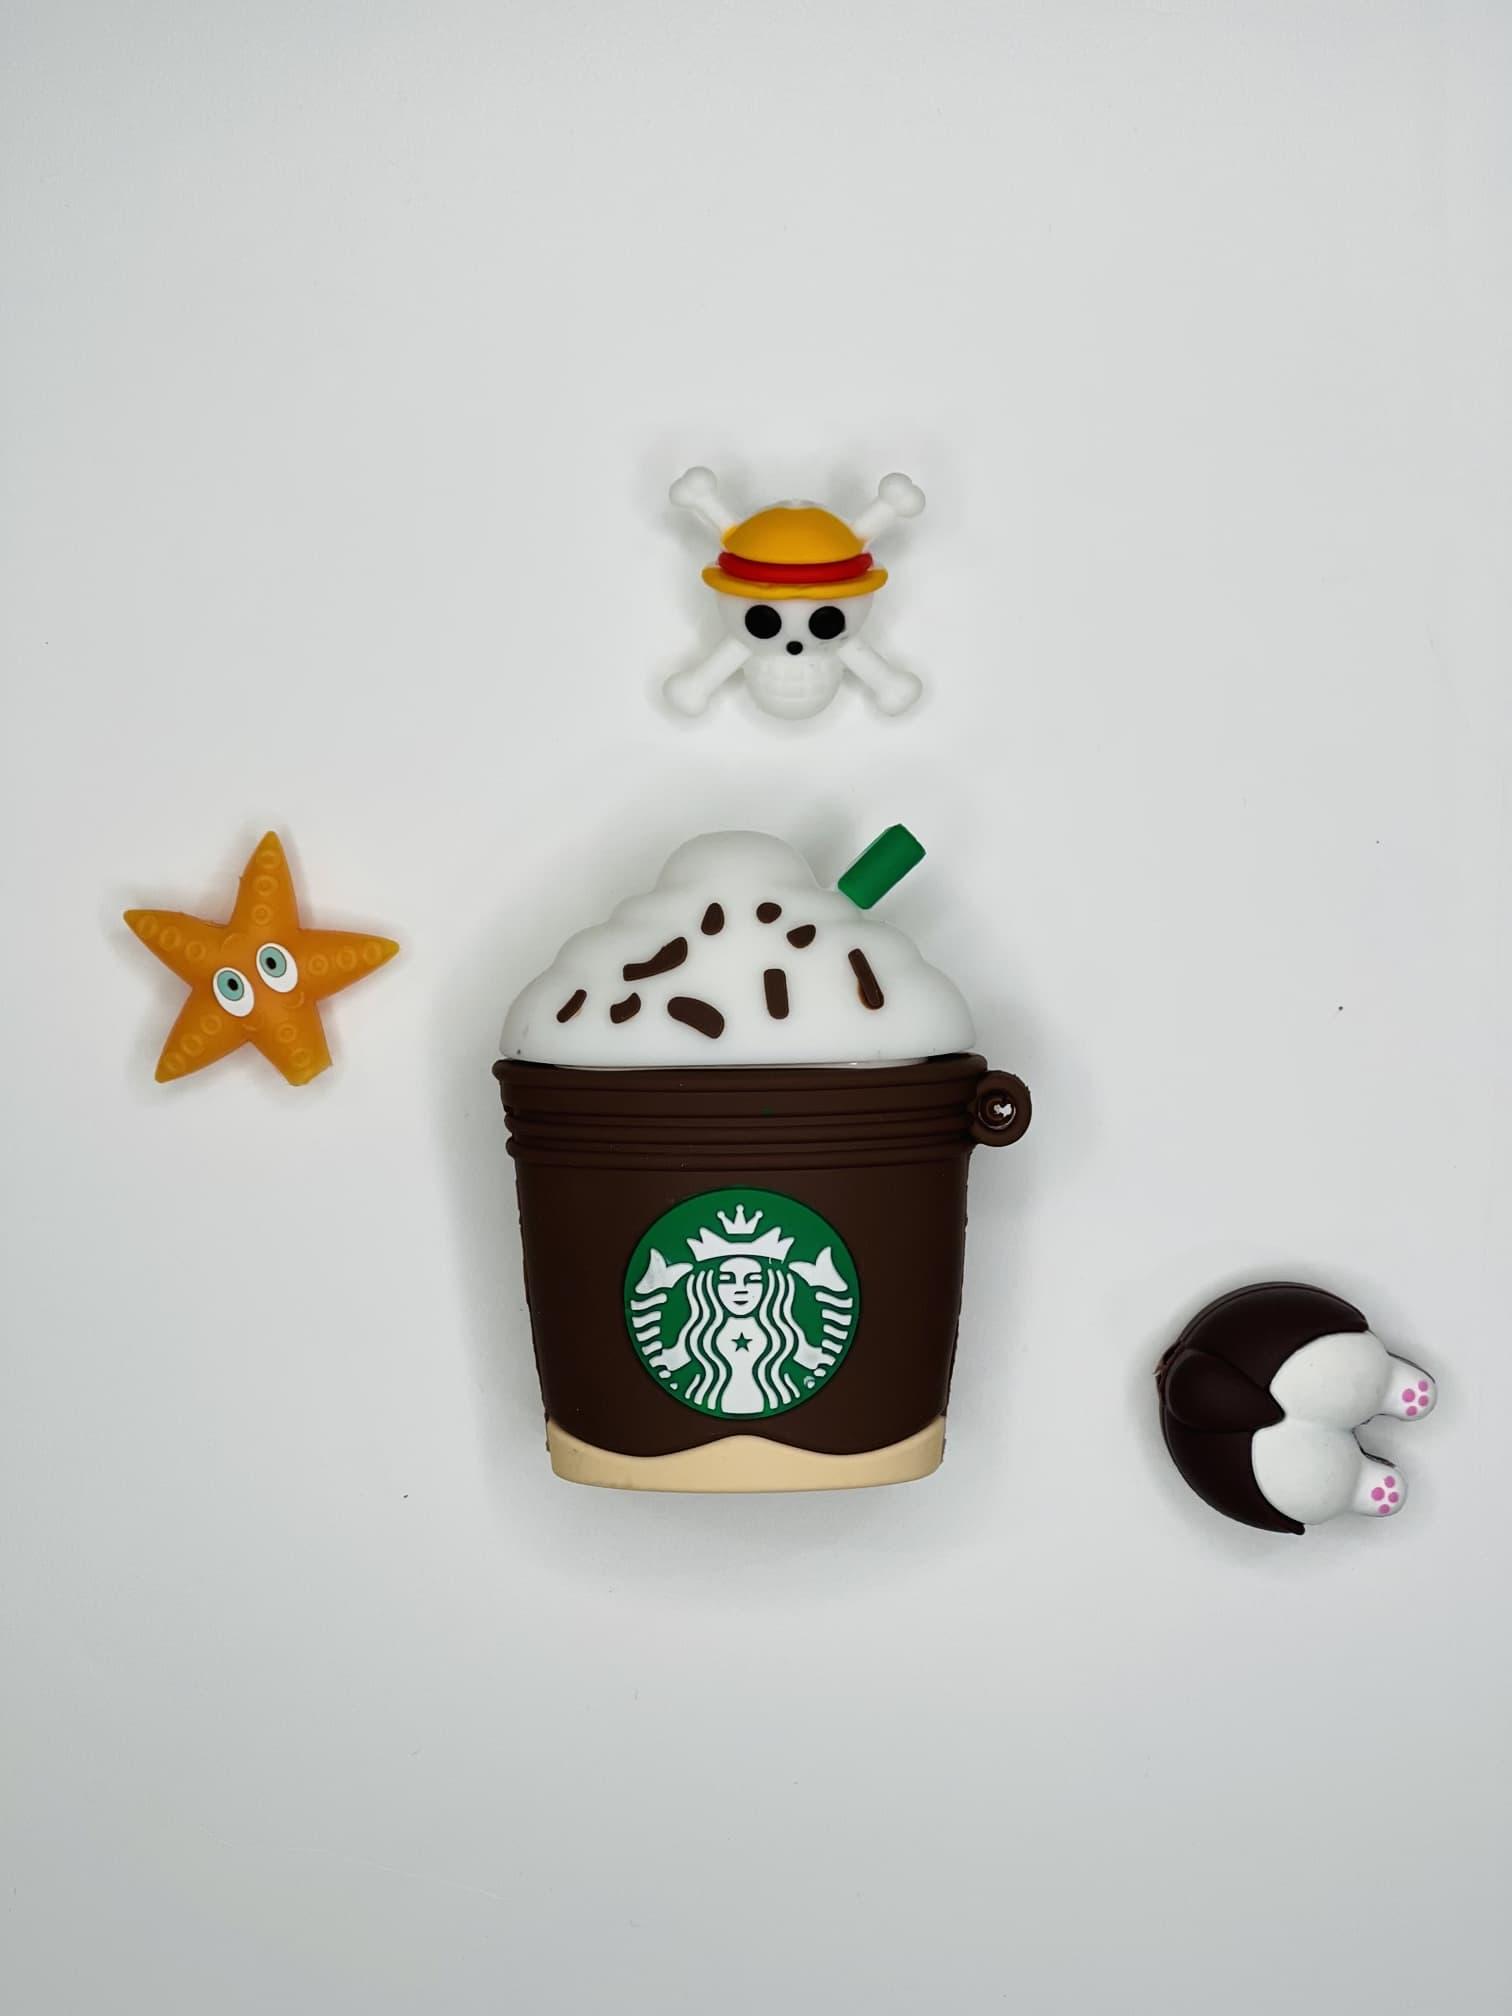 Starbucks Kahve Figürlü AirPods 2 Kılıfı